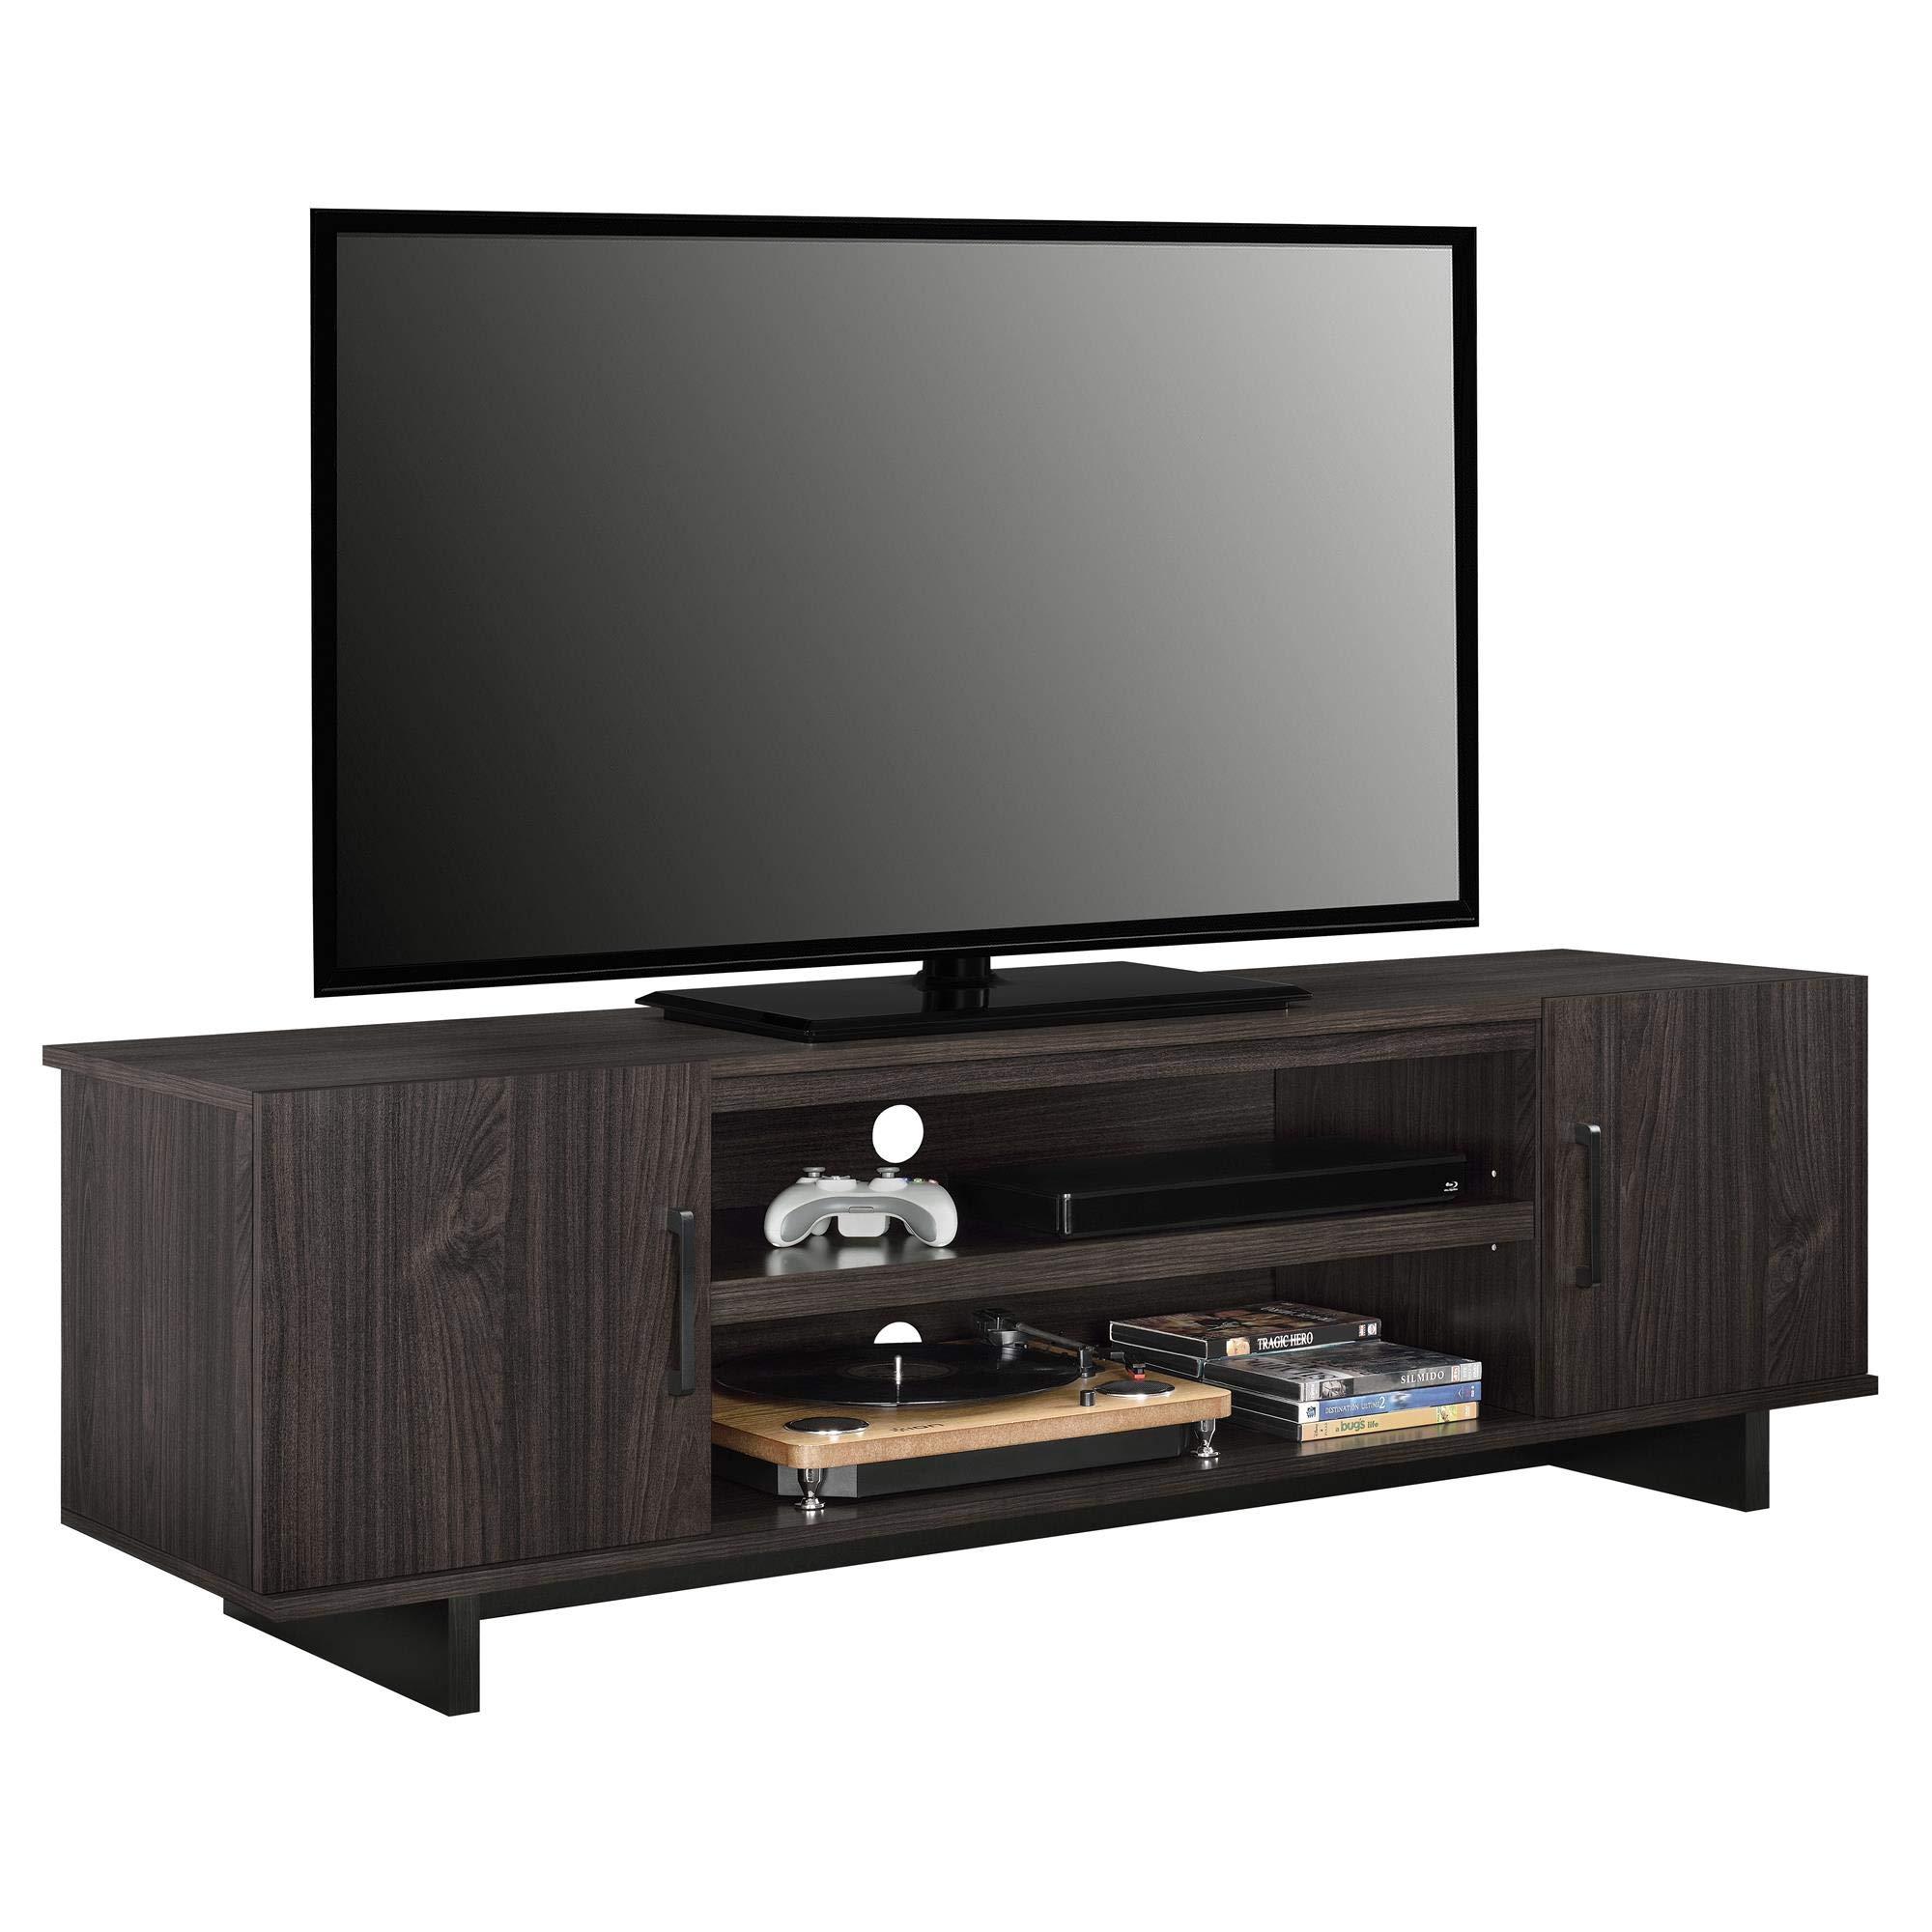 Ameriwood Home Southlander TV Stand, Espresso